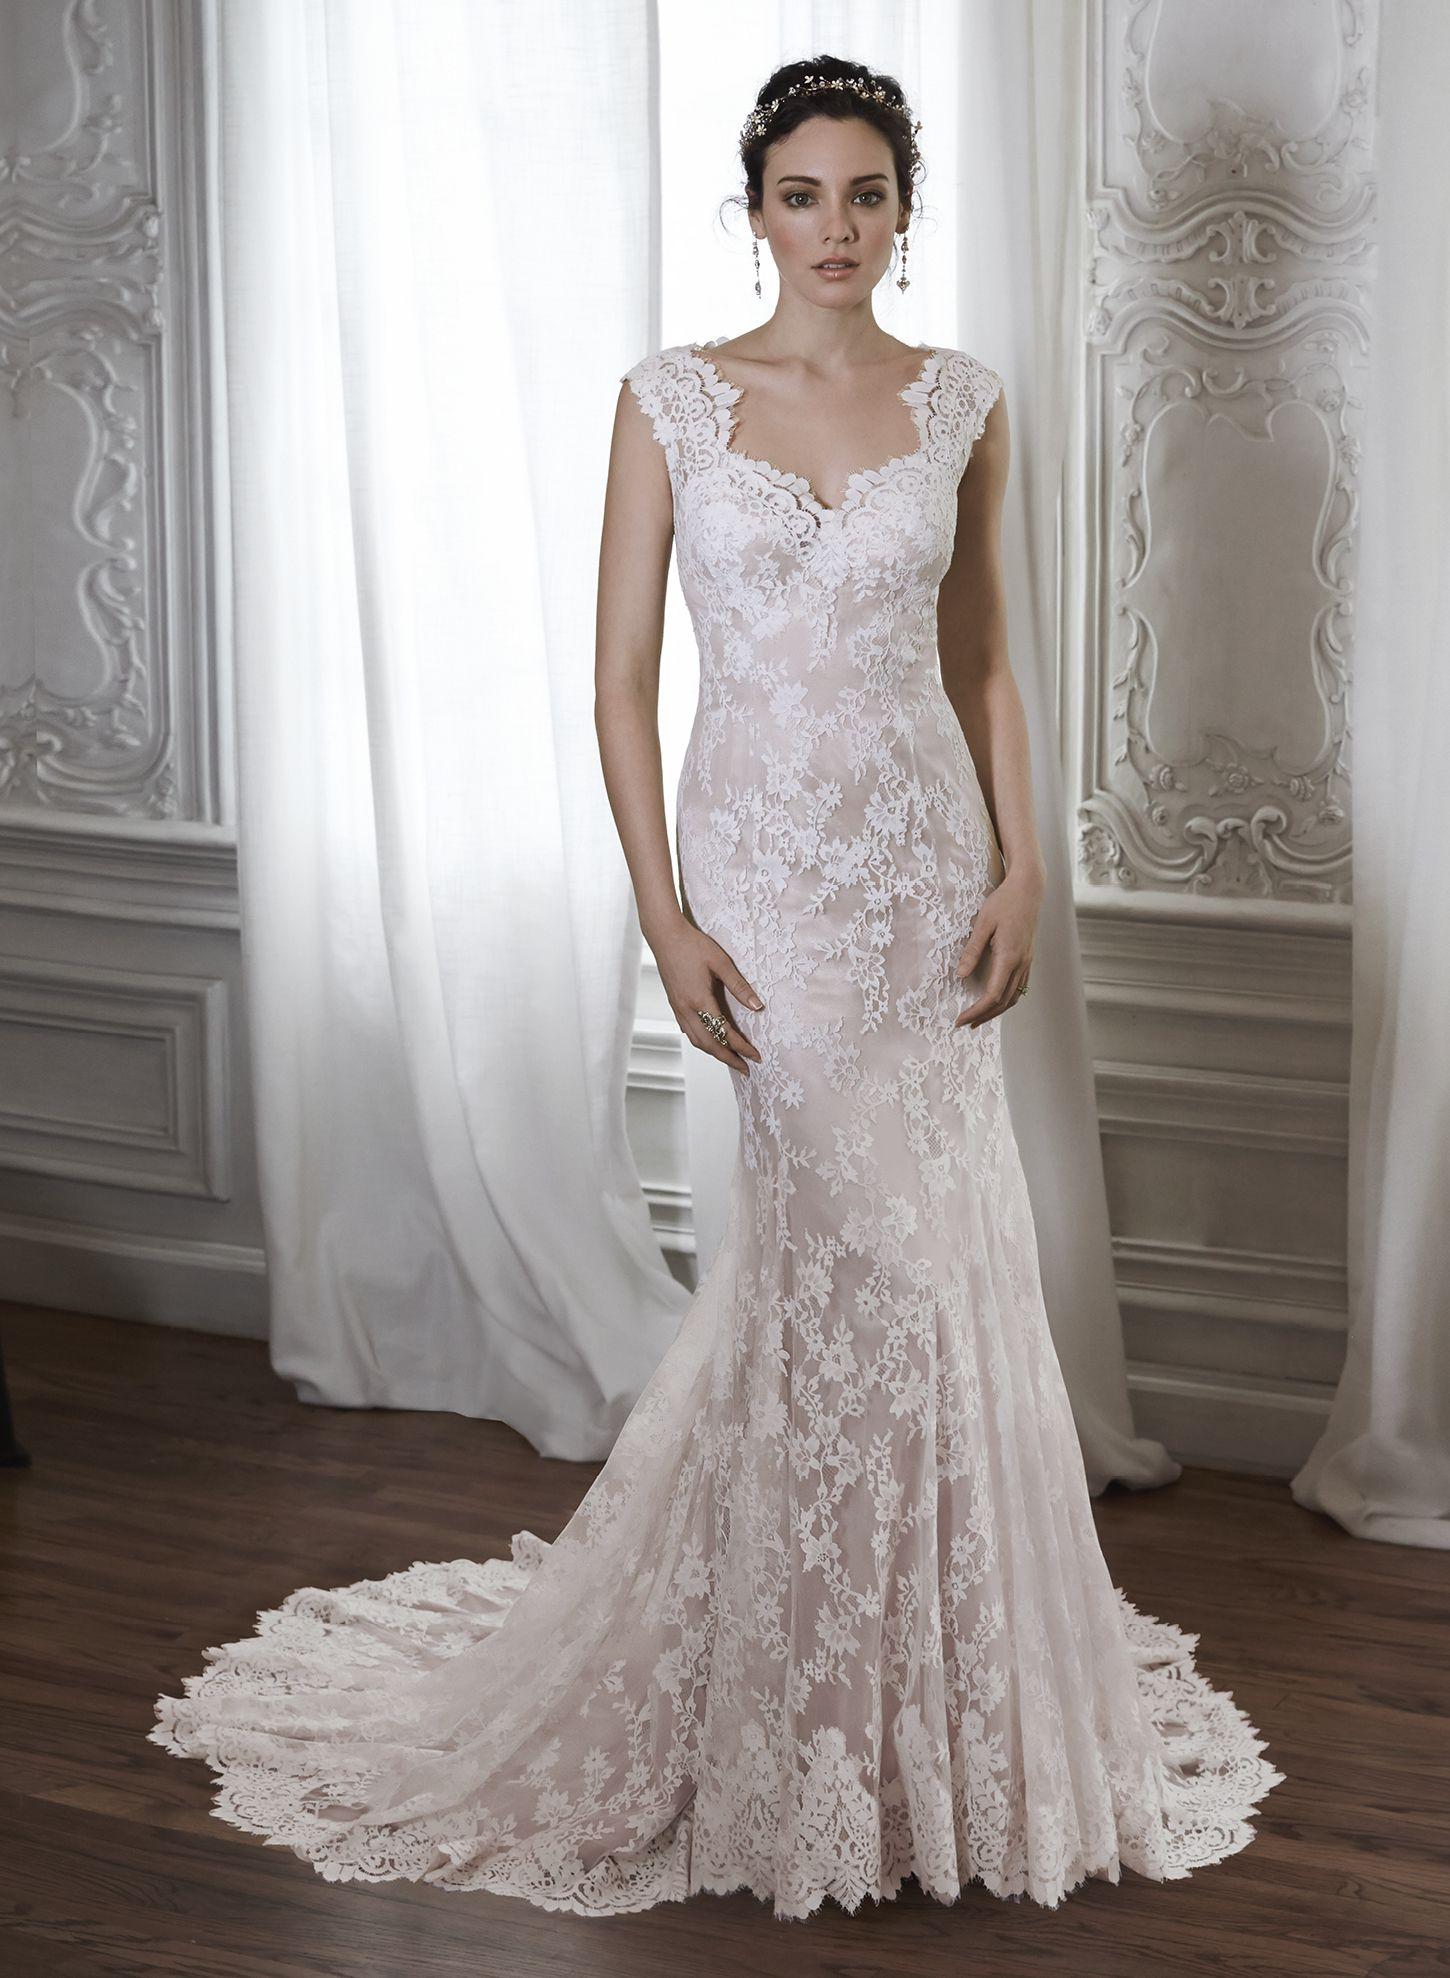 Trending Maggie Sottero Wedding Dresses